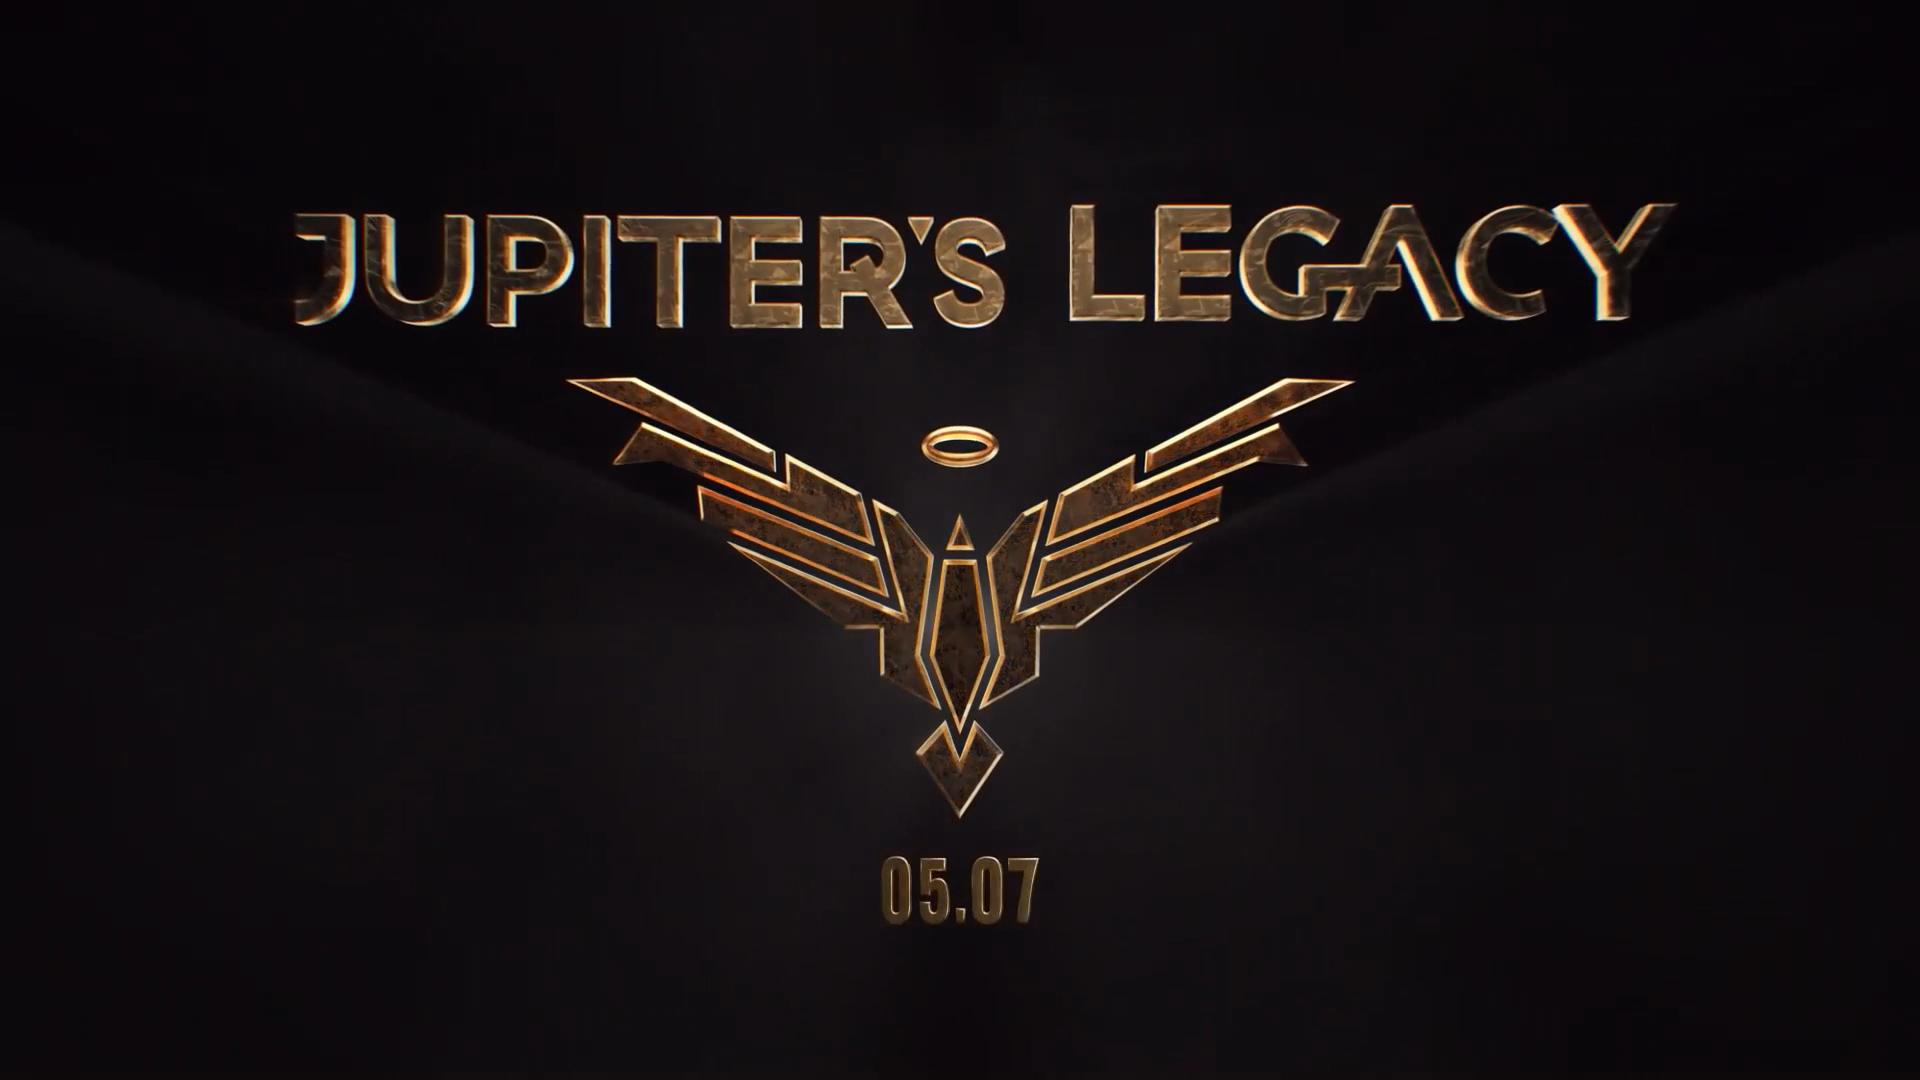 Jupiters Legacy 2021